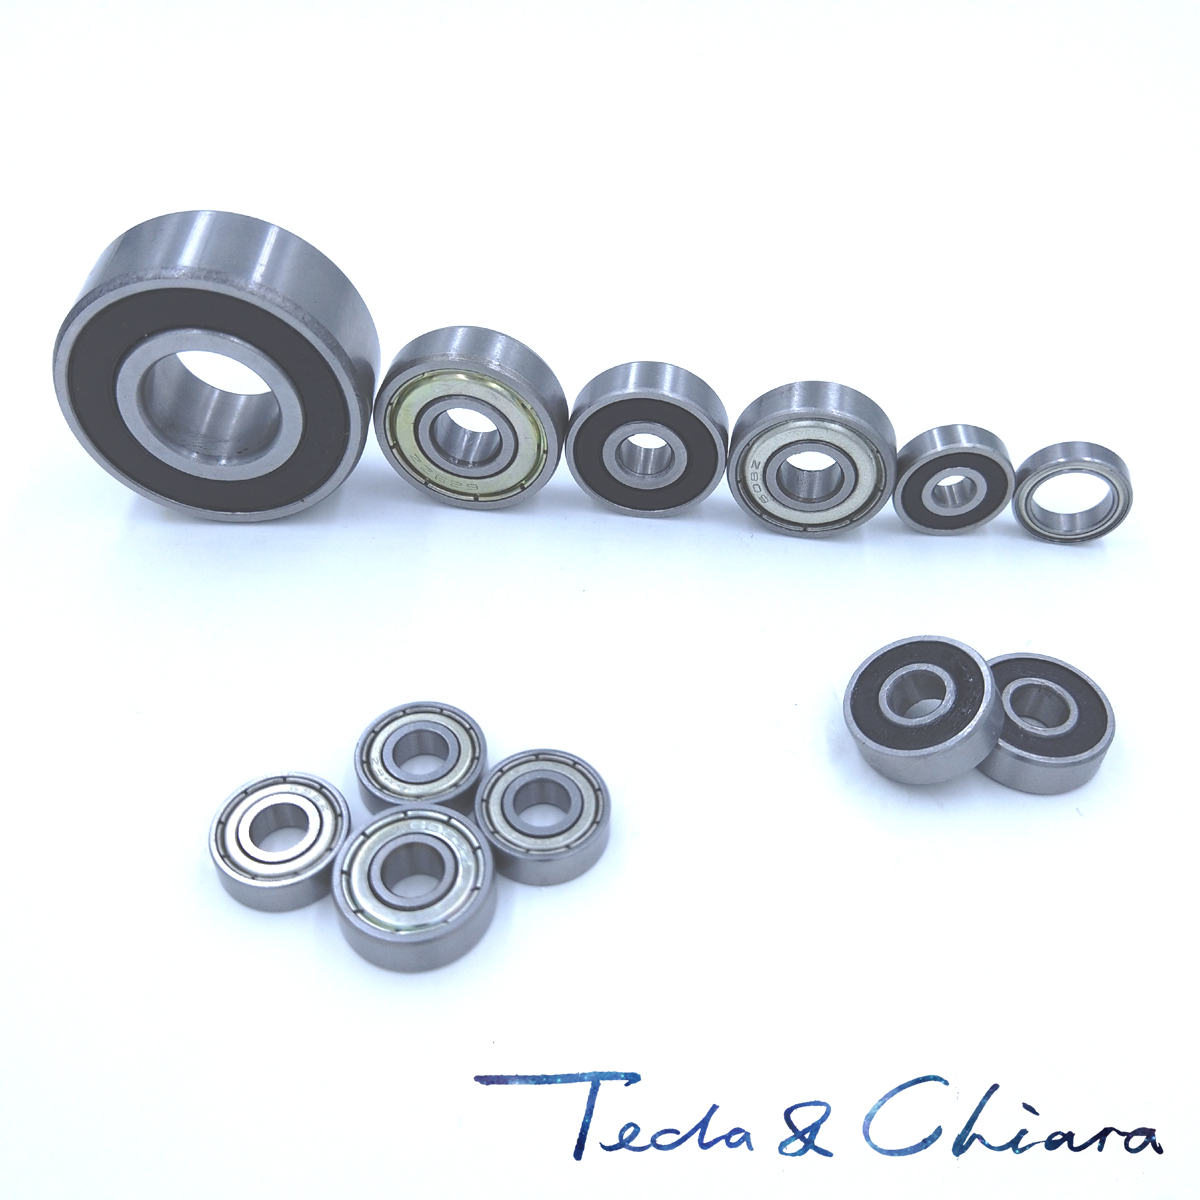 6000 6000ZZ 6000RS 6000-2Z 6000Z 6000-2RS ZZ RS RZ 2RZ Deep Groove Ball Bearings 10 X 26 X 8mm